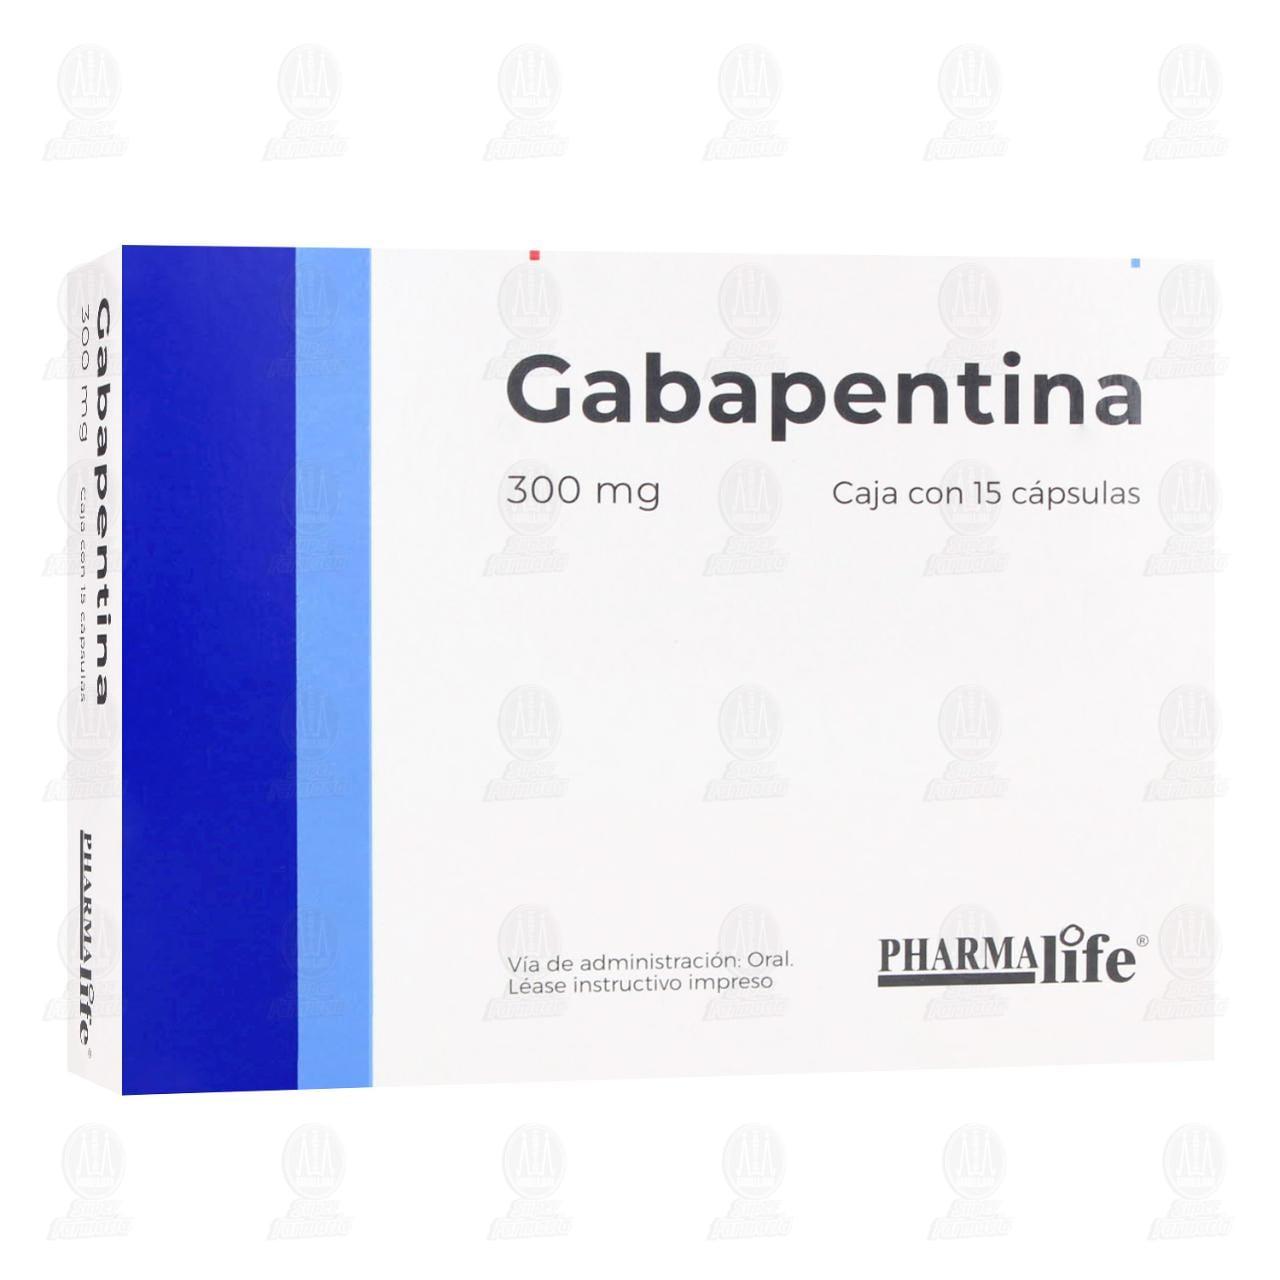 Comprar Gabapentina 300mg 15 Cápsulas Pharmalife en Farmacias Guadalajara